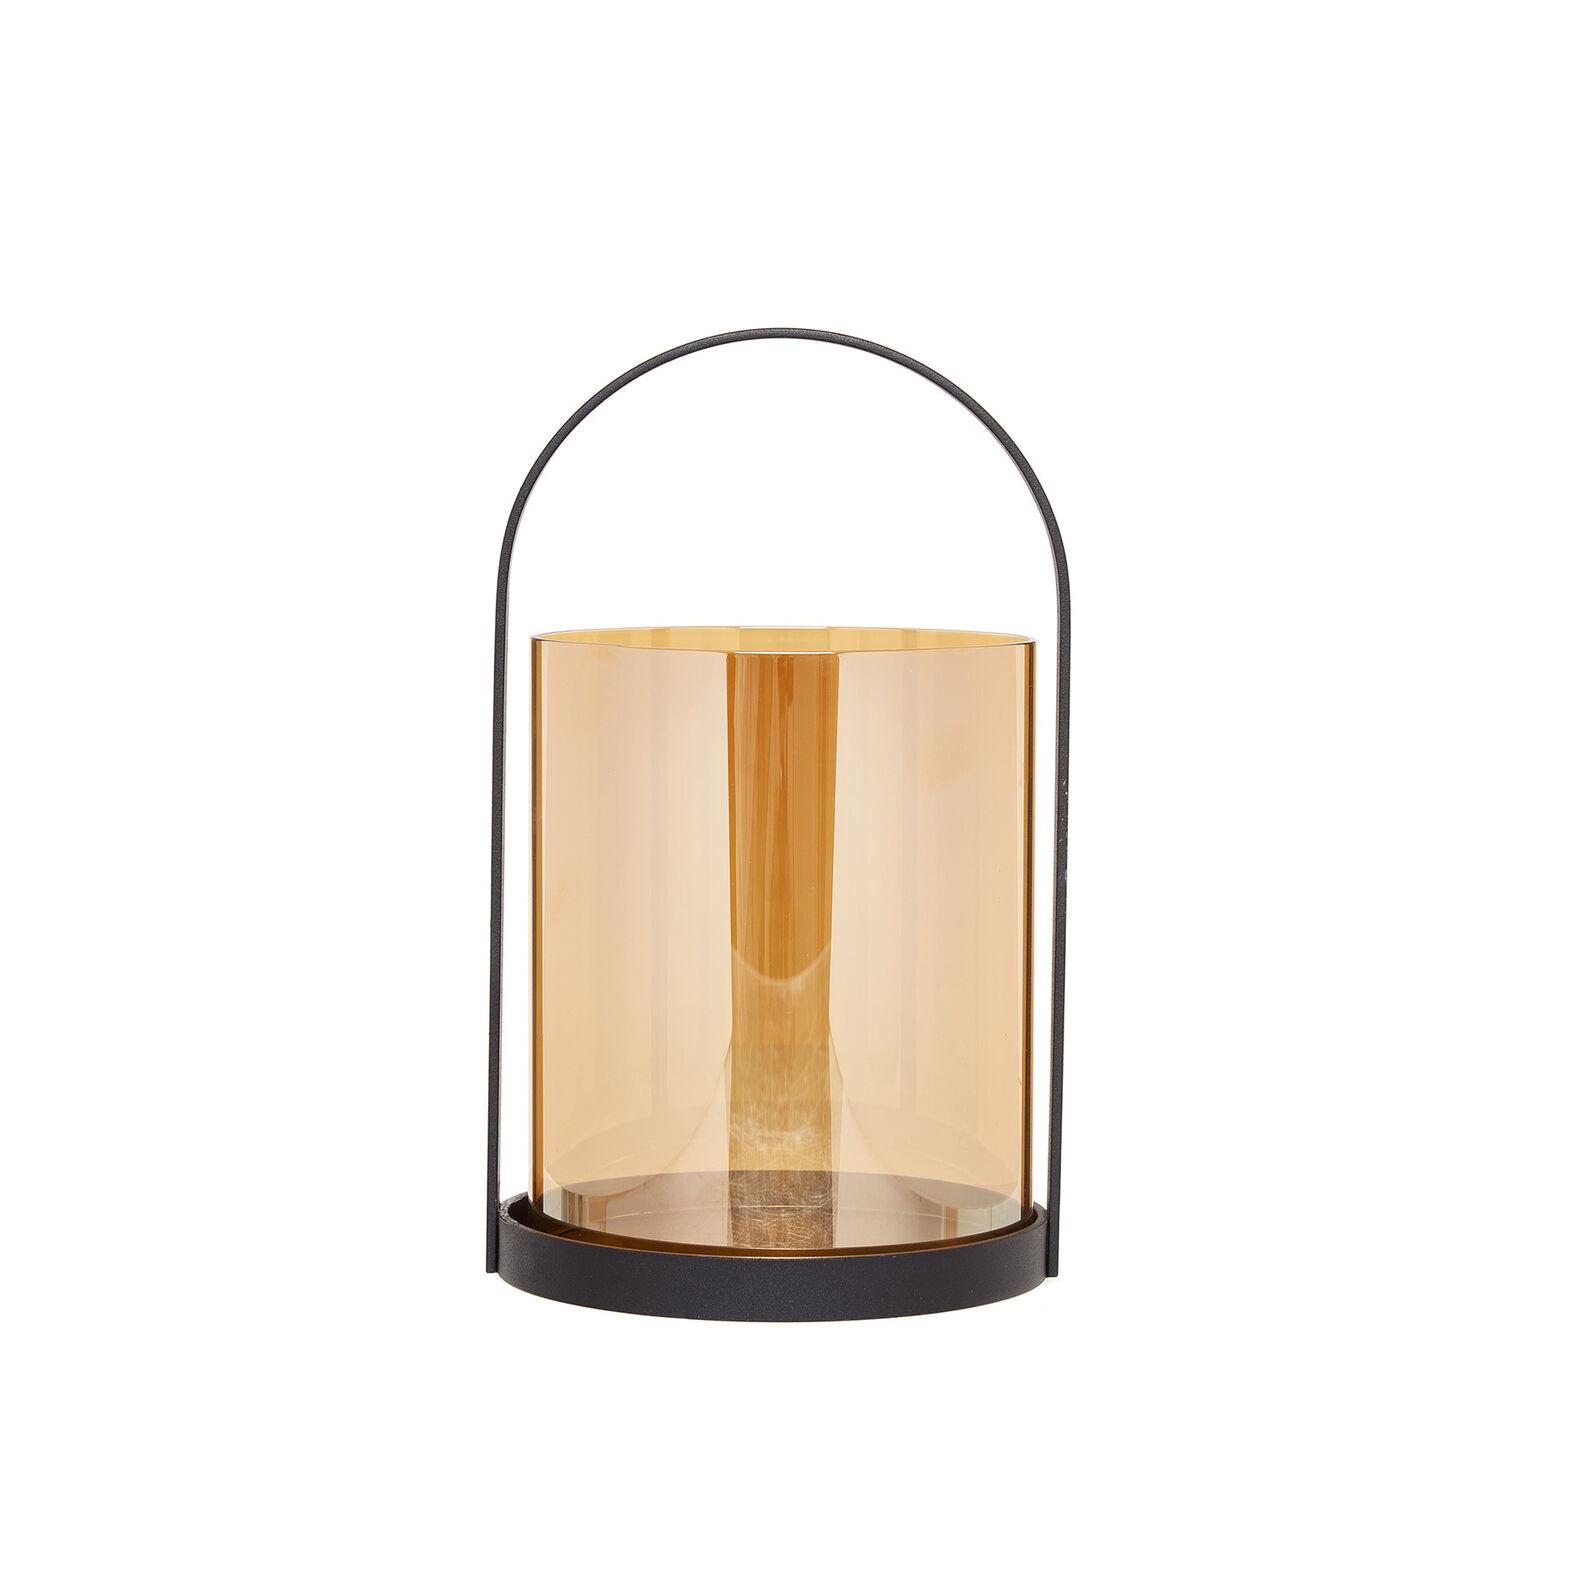 Glass lantern with iron handle